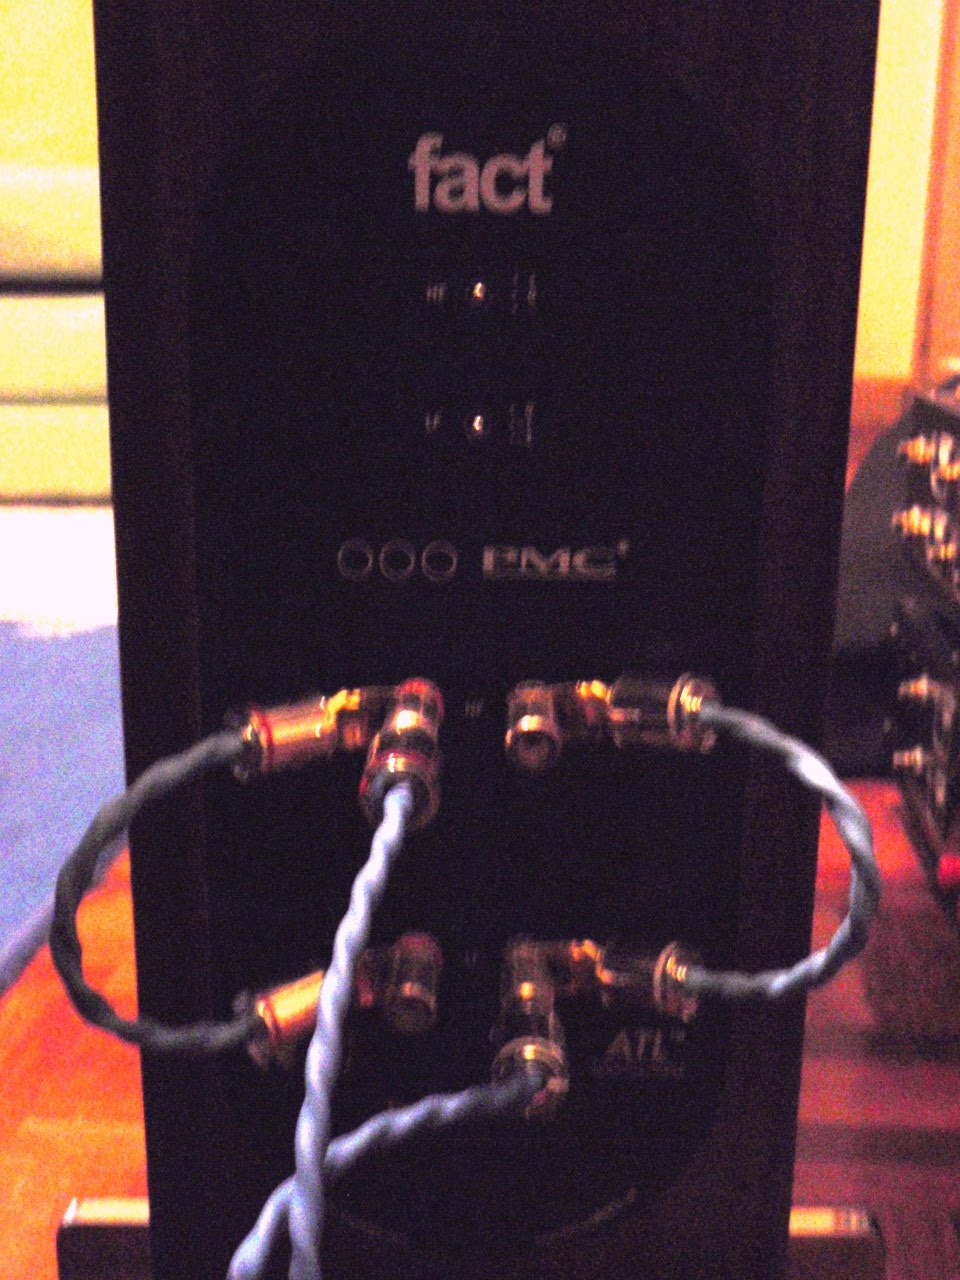 hifi unlimited 330l 550l 770l siltech classic anniversary 550l speaker jumper cables. Black Bedroom Furniture Sets. Home Design Ideas